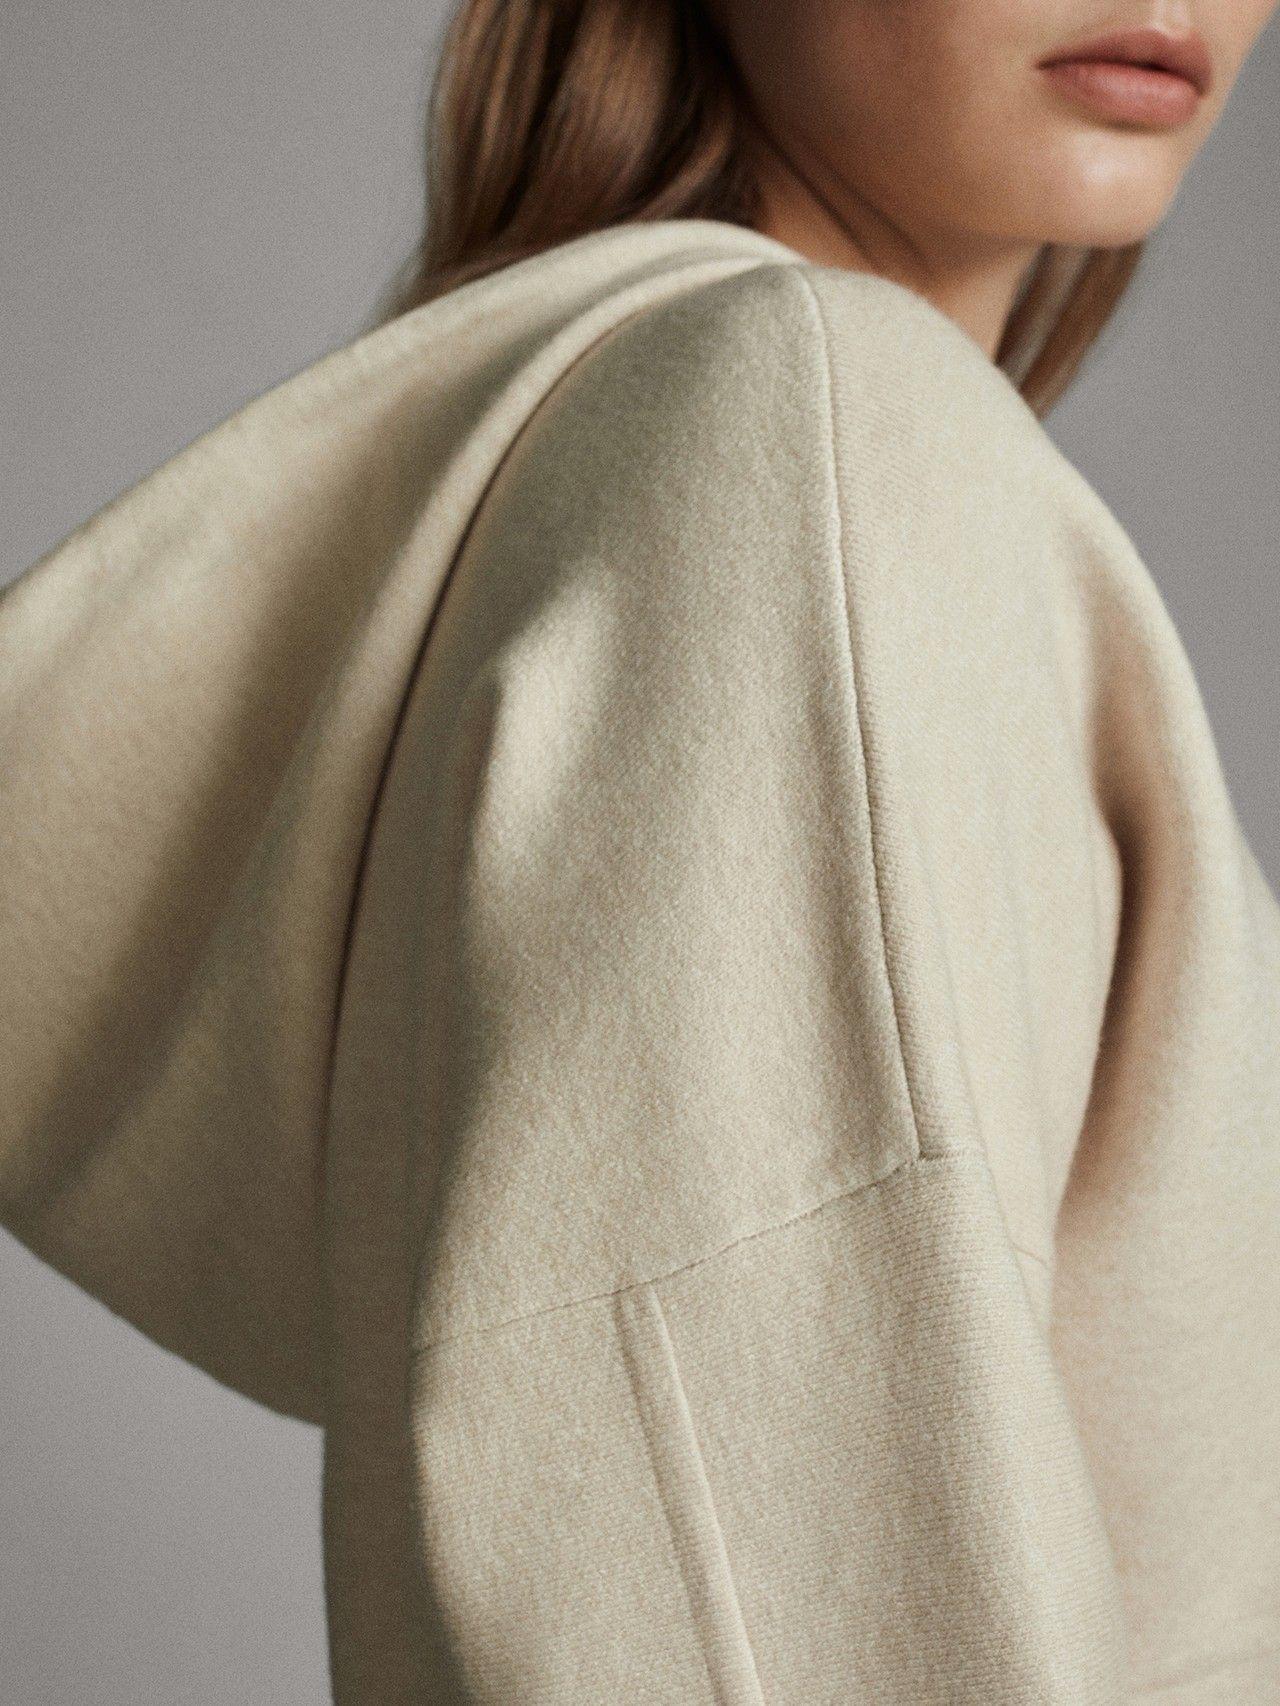 Massimo Dutti Mujer Capa Capucha De Punto Beige Xs Massimo Dutti Tracksuit Women Knit Hoodie